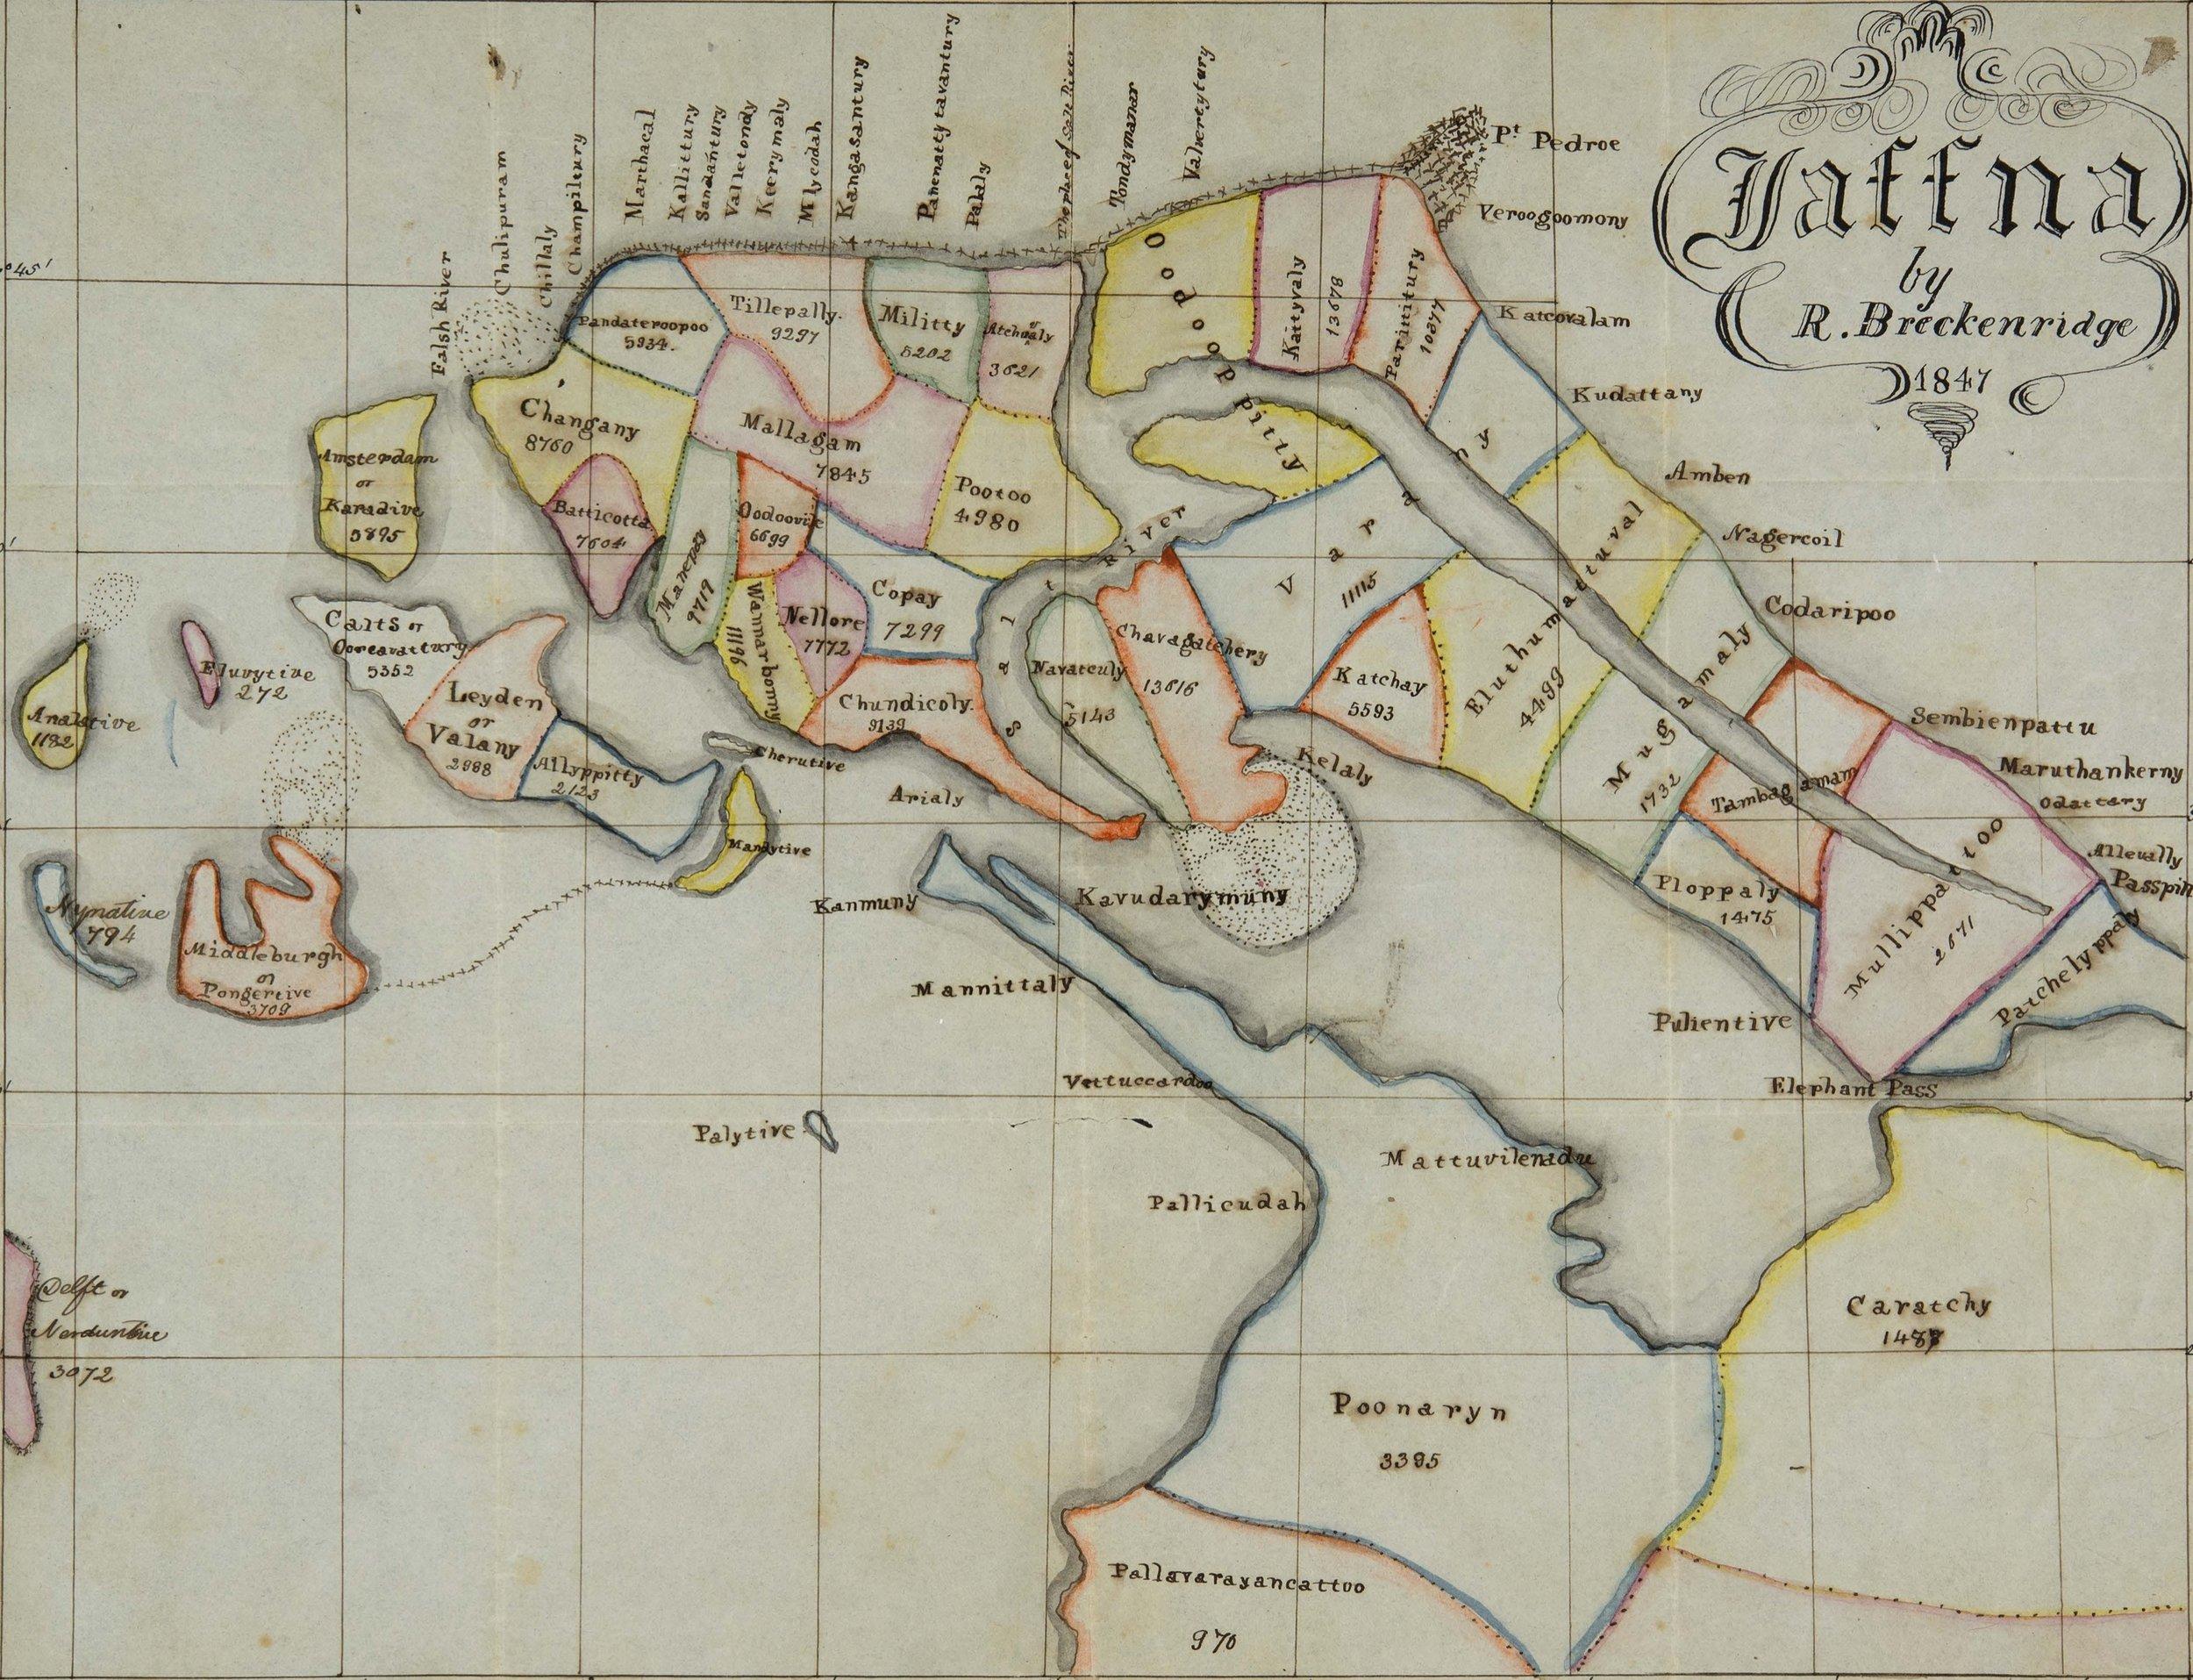 """Jaffna,"" Robert Breckenridge, 1847. Source: Mount Holyoke Archives"